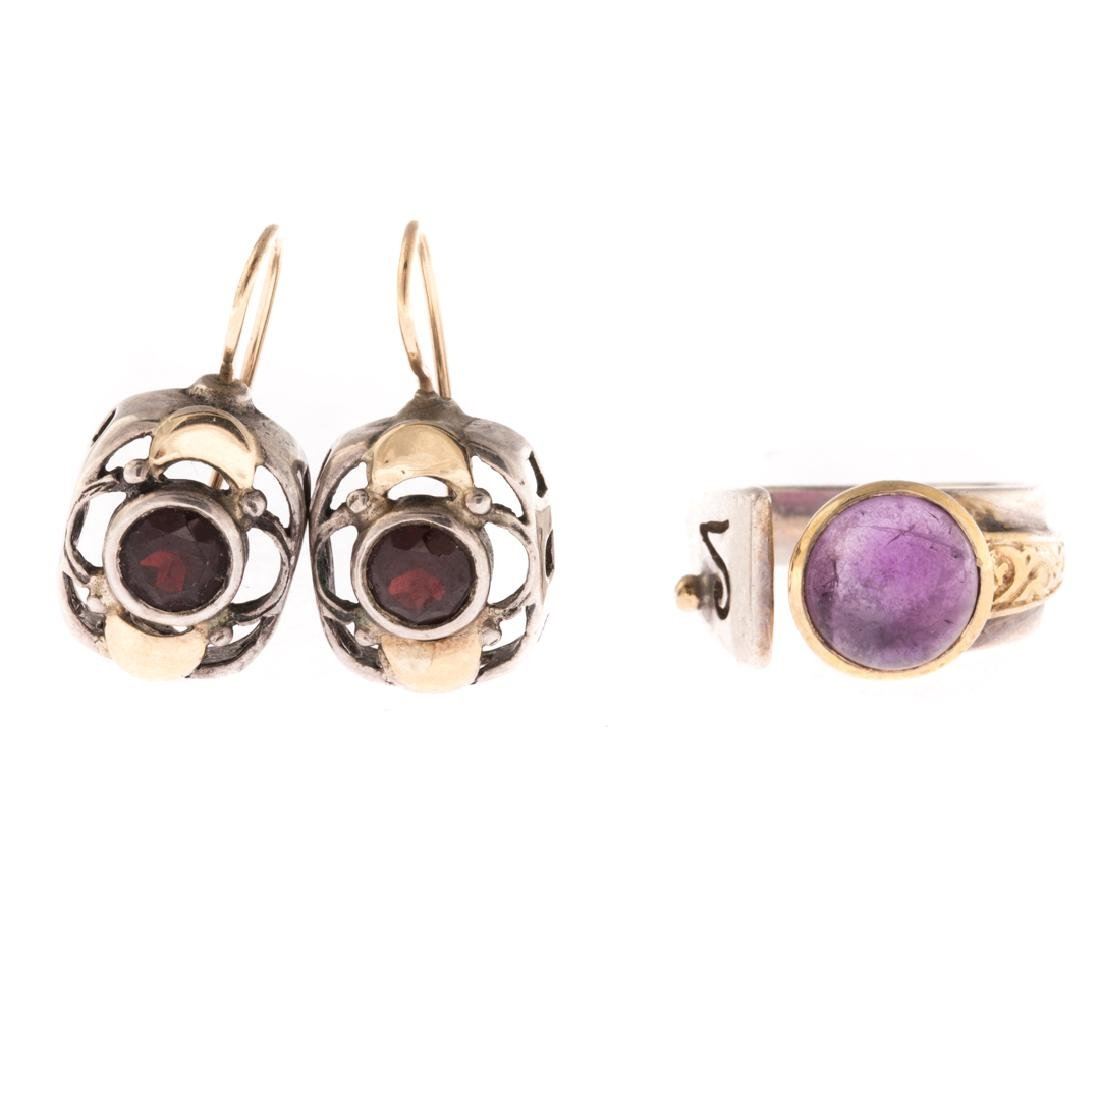 A Contemporary Amethyst Ring & Garnet Earrings